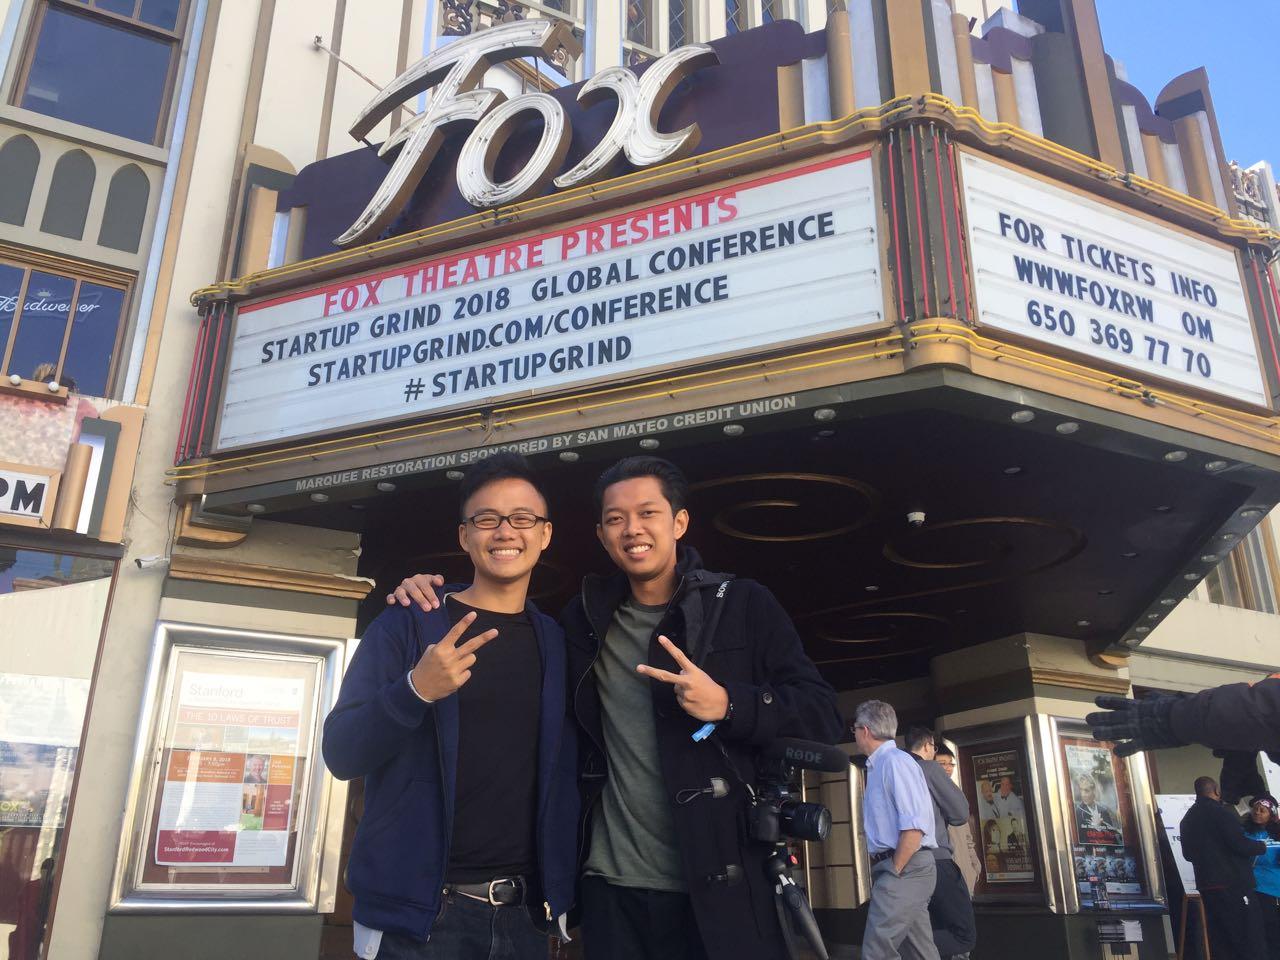 Pemenang NextDev 2017 mendapatkan privilege ke Silicon Valley (AS)